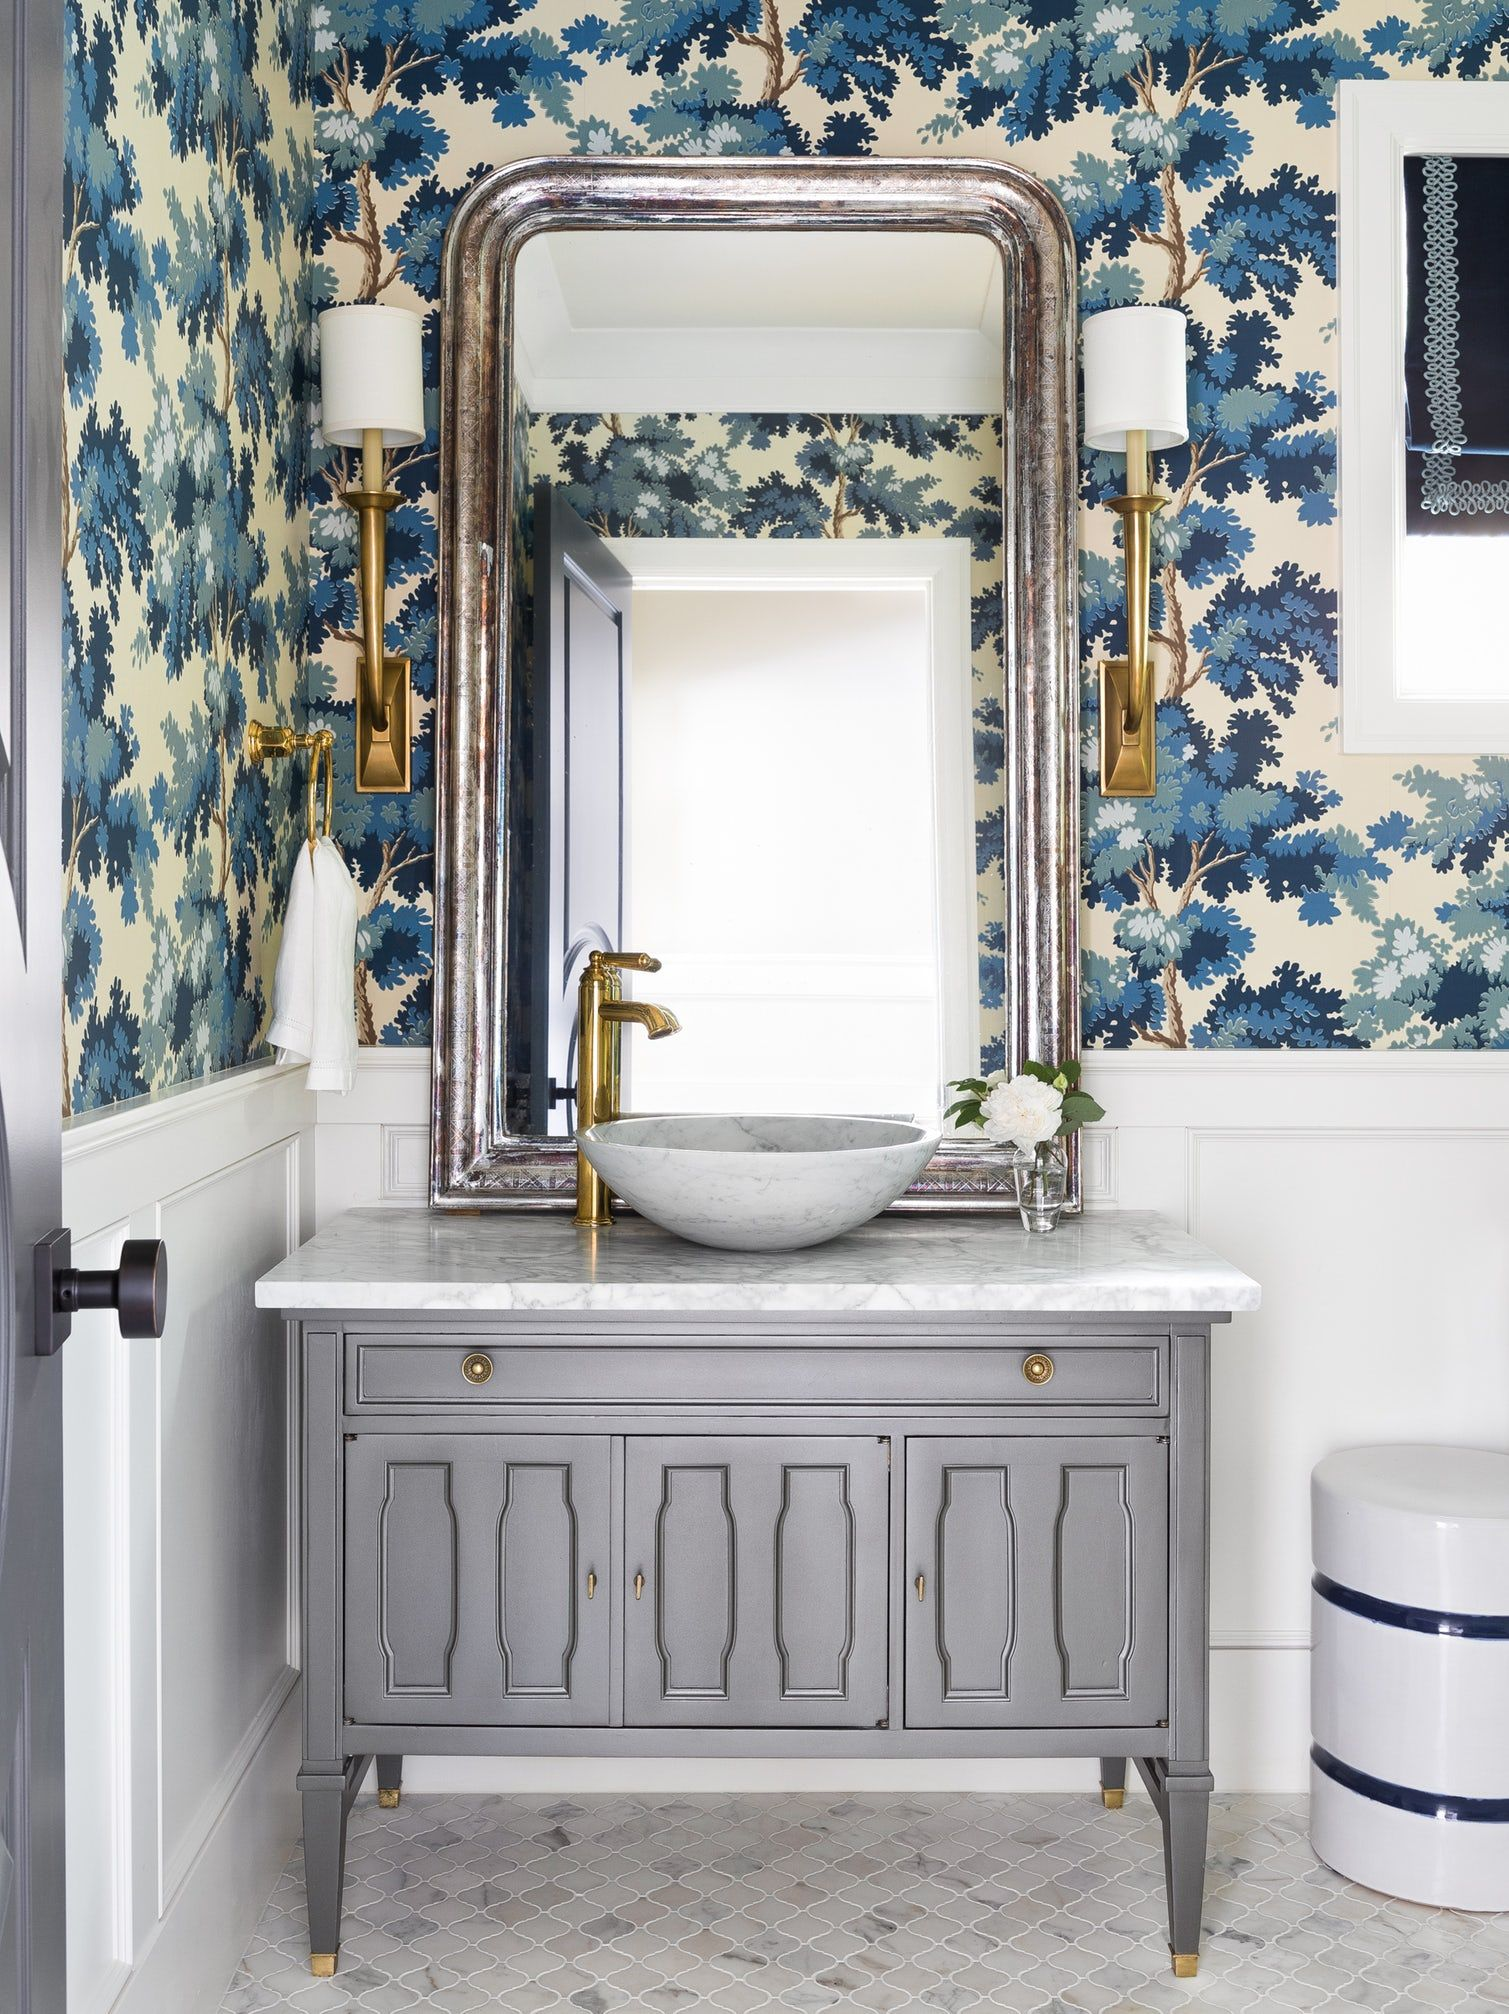 40 stunning powder room ideas half